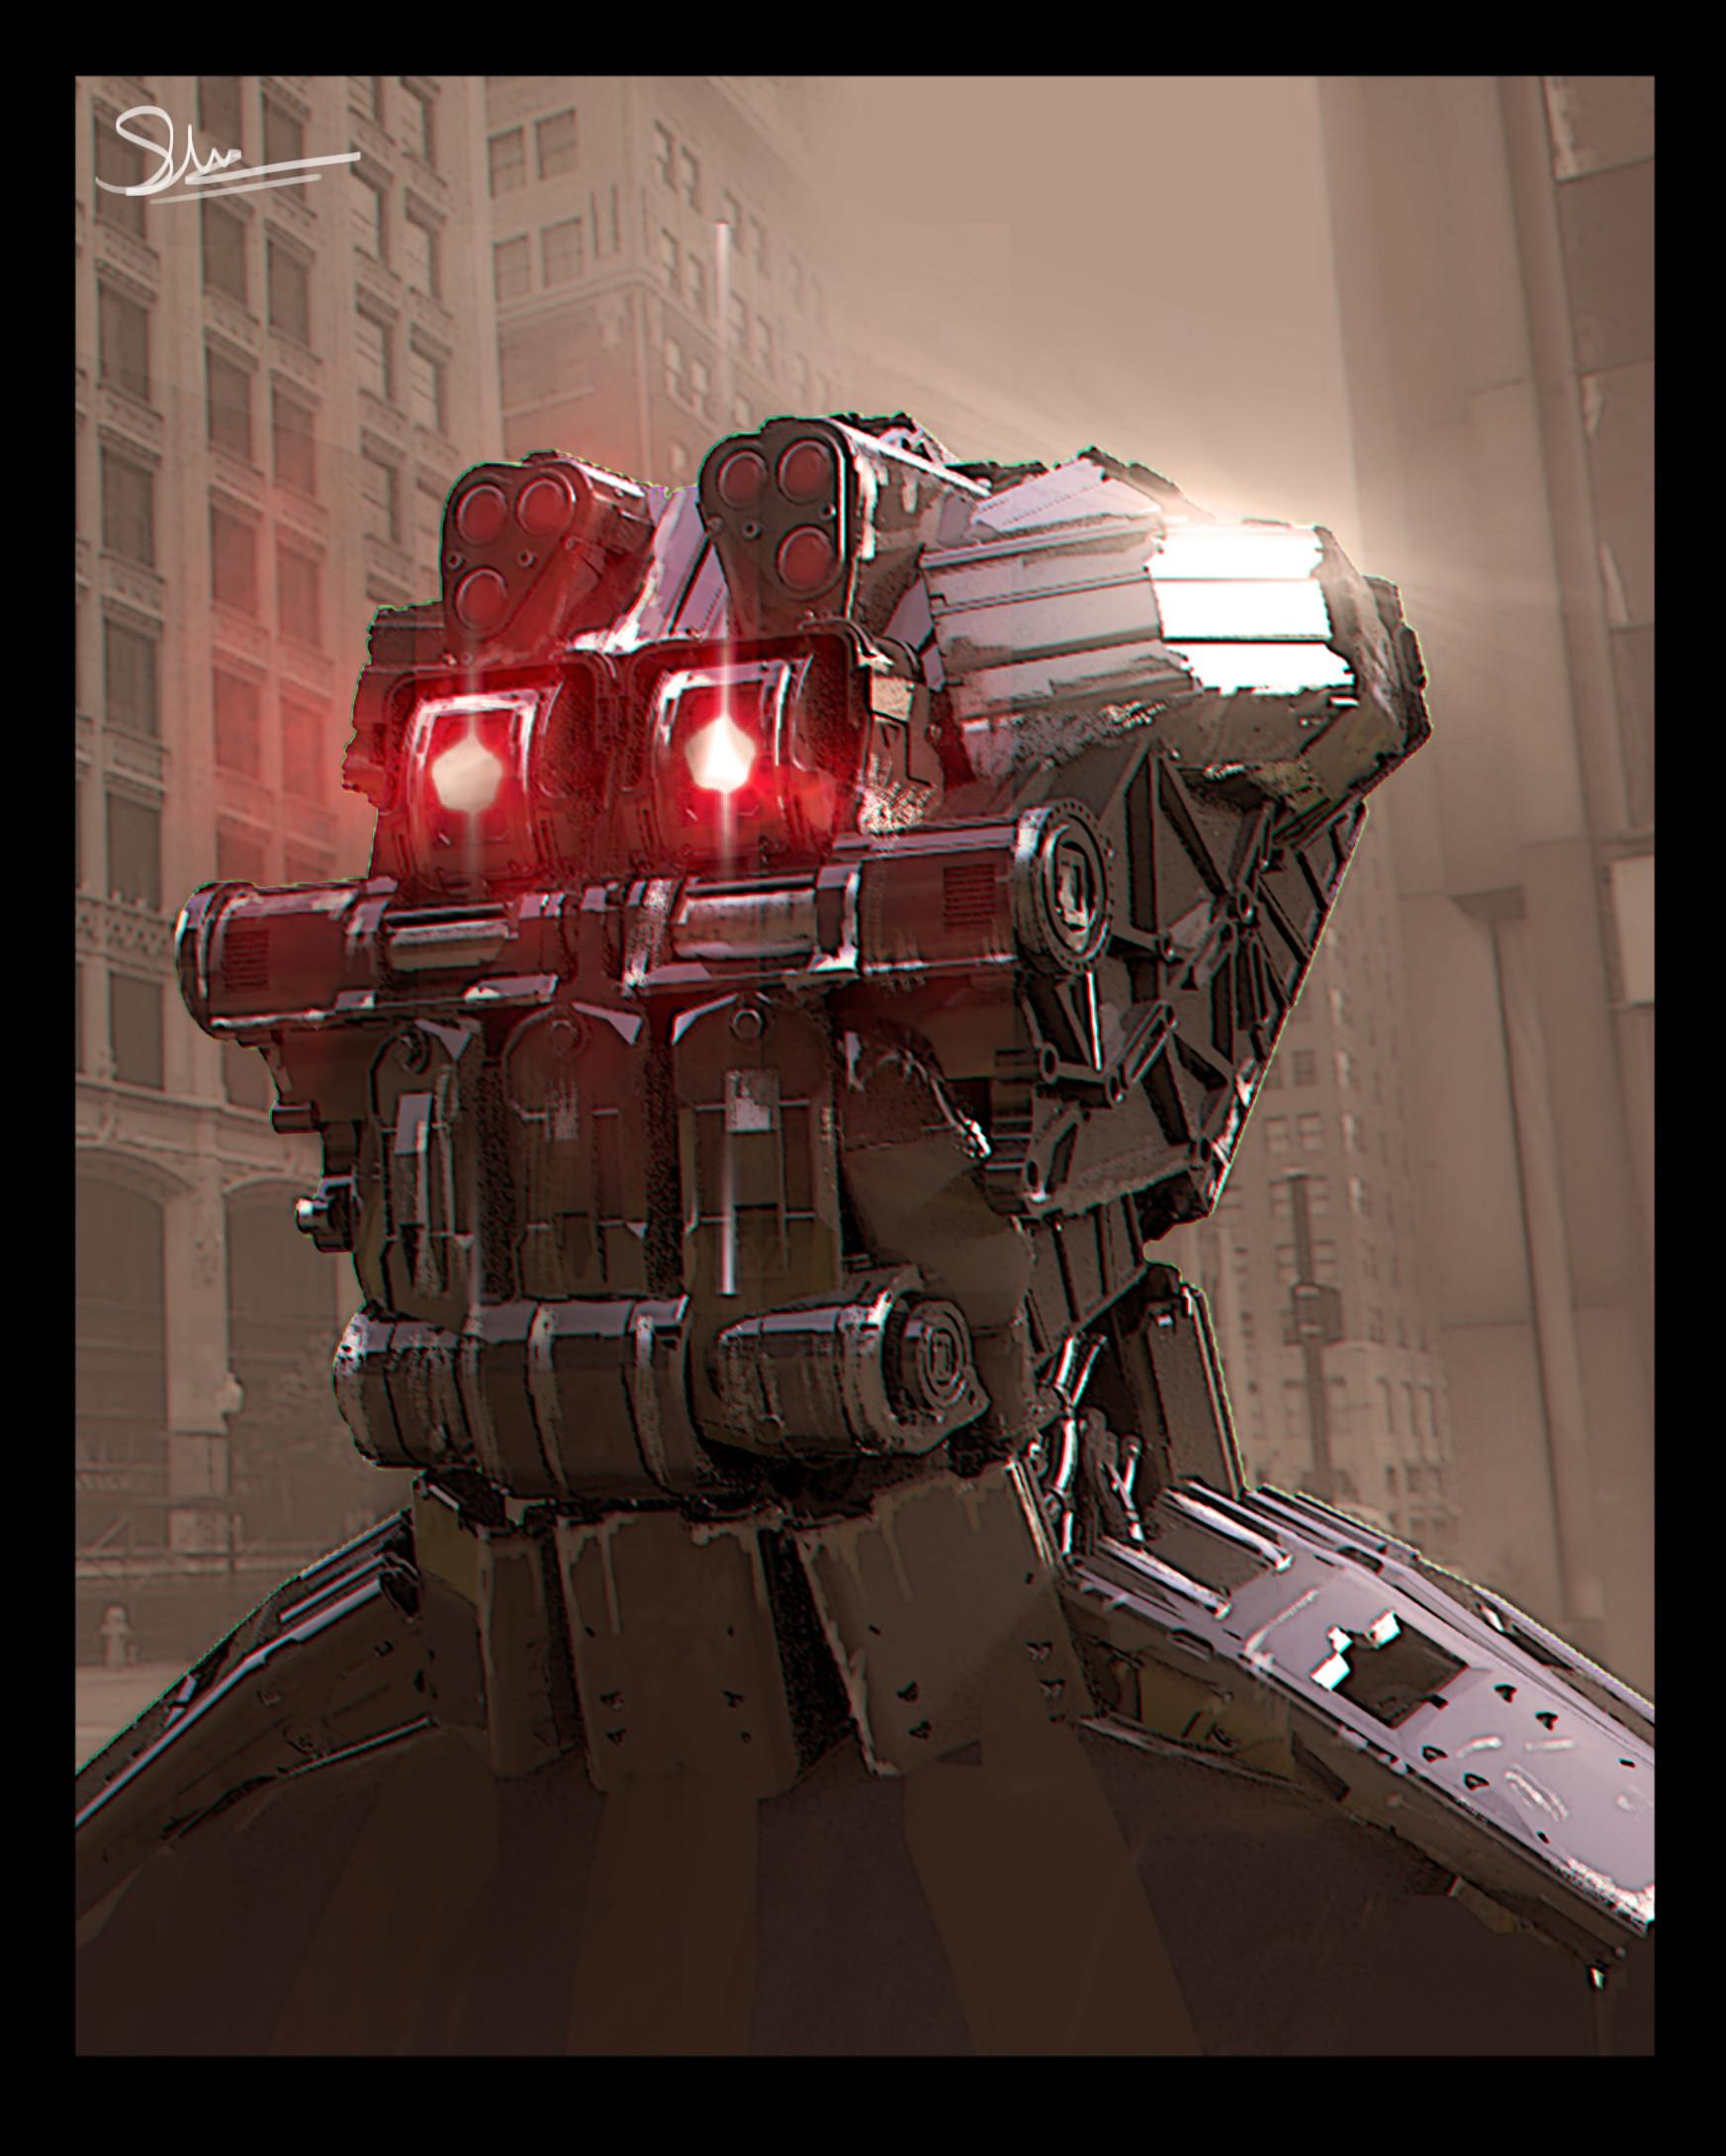 Shwetank shukla robot concept one